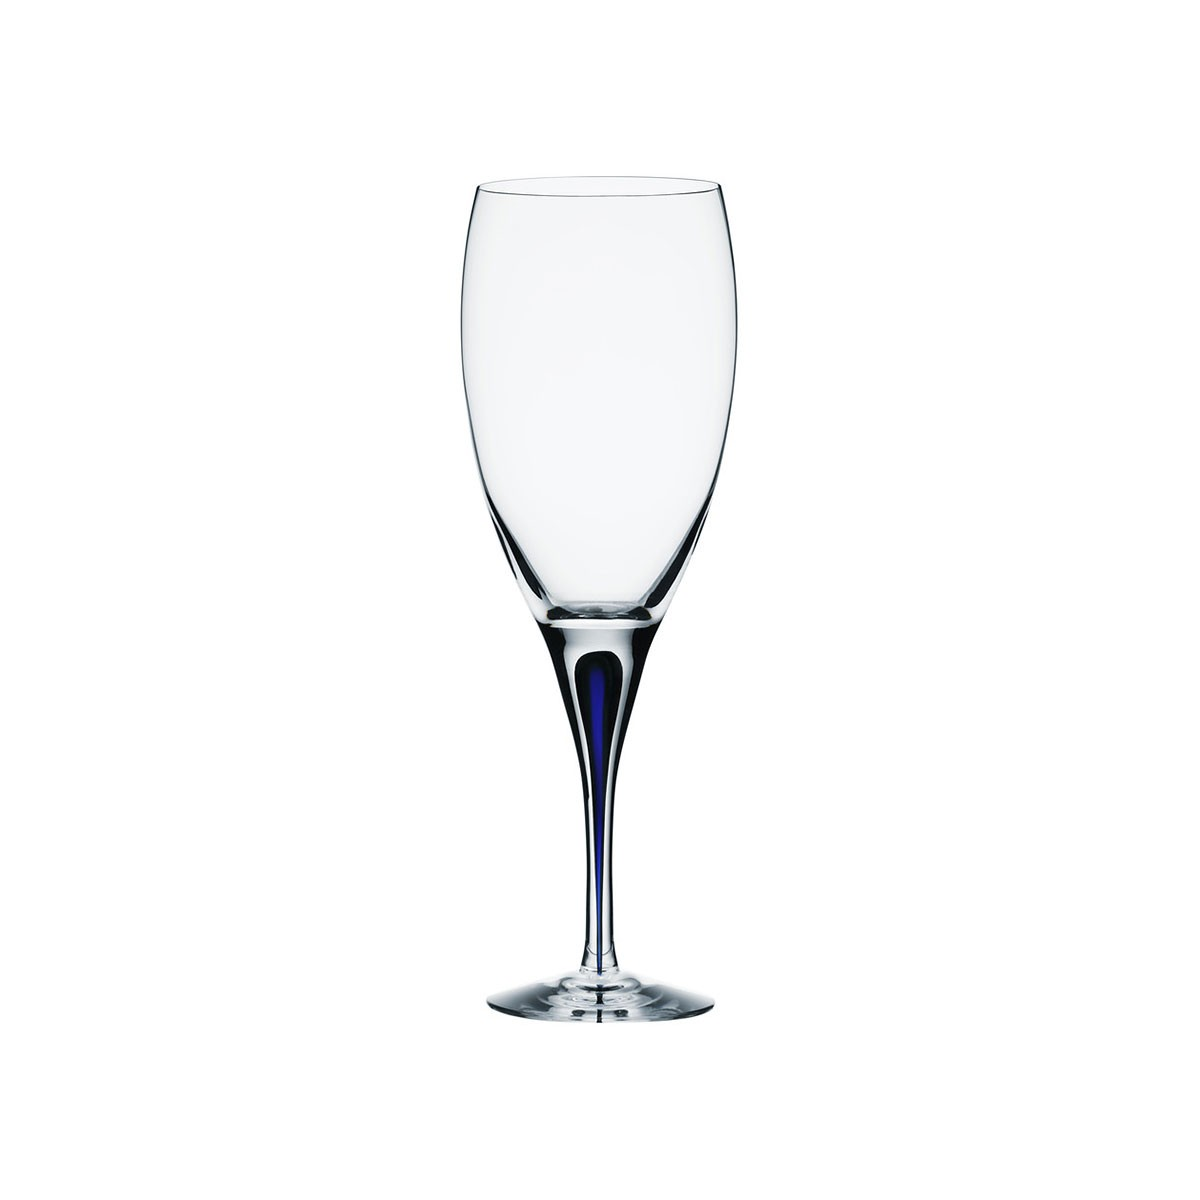 Orrefors Of Sweden I Intermezzo Blue Goblet 33 cl